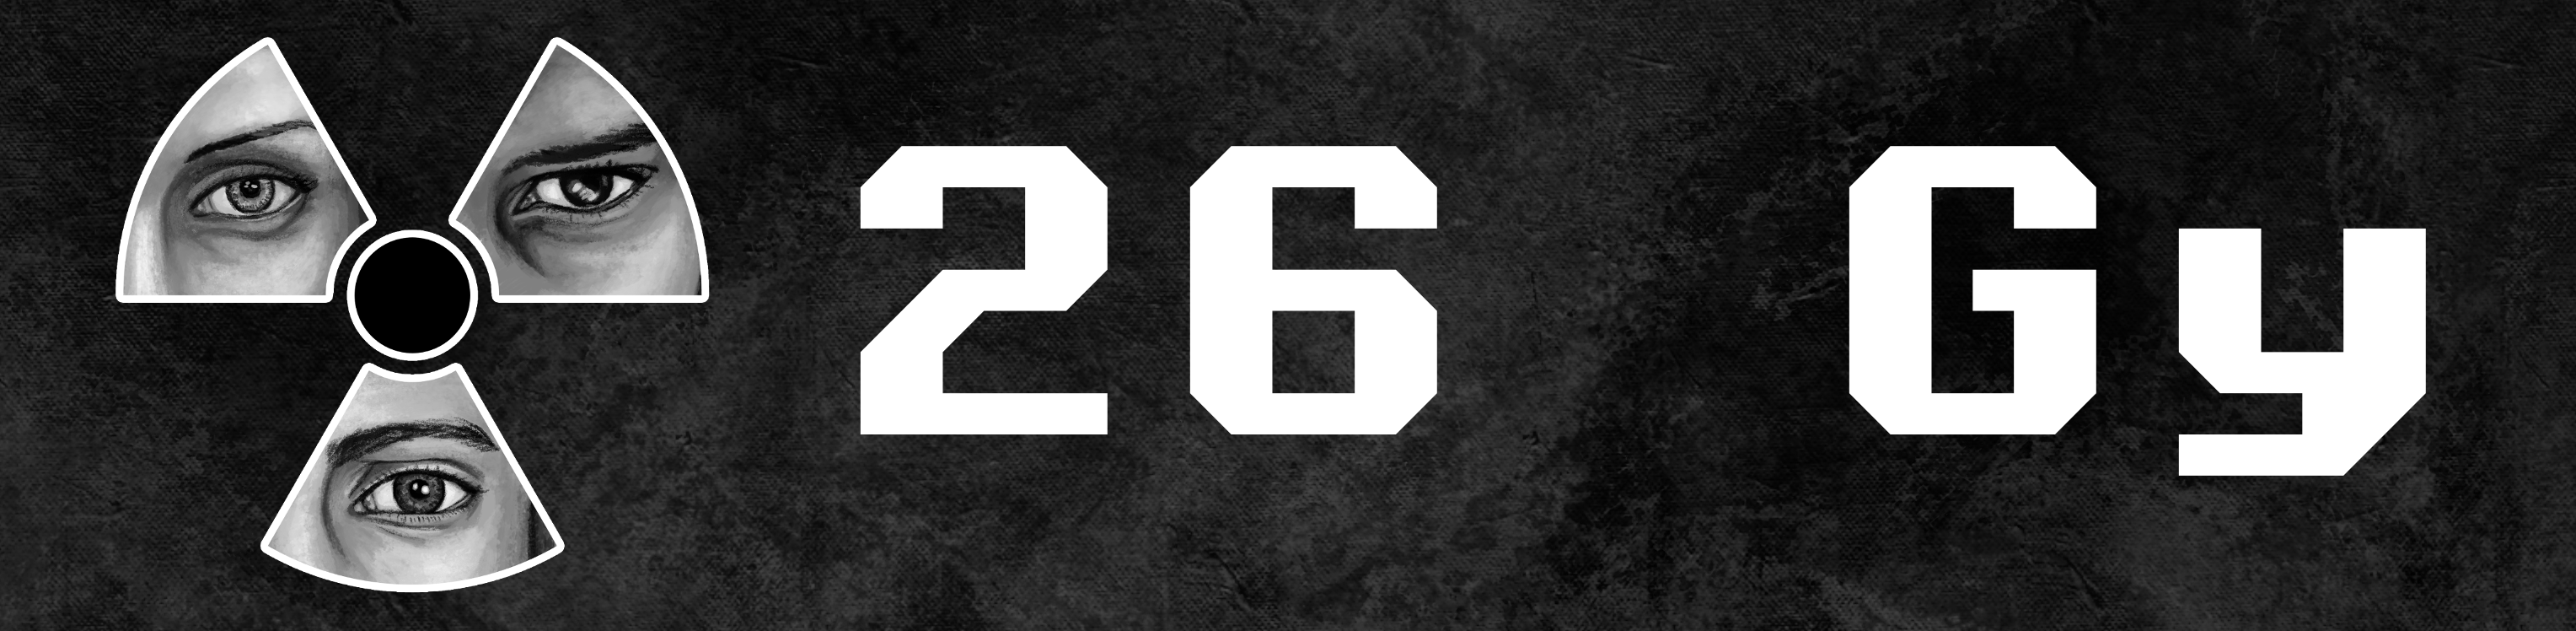 26 Gy